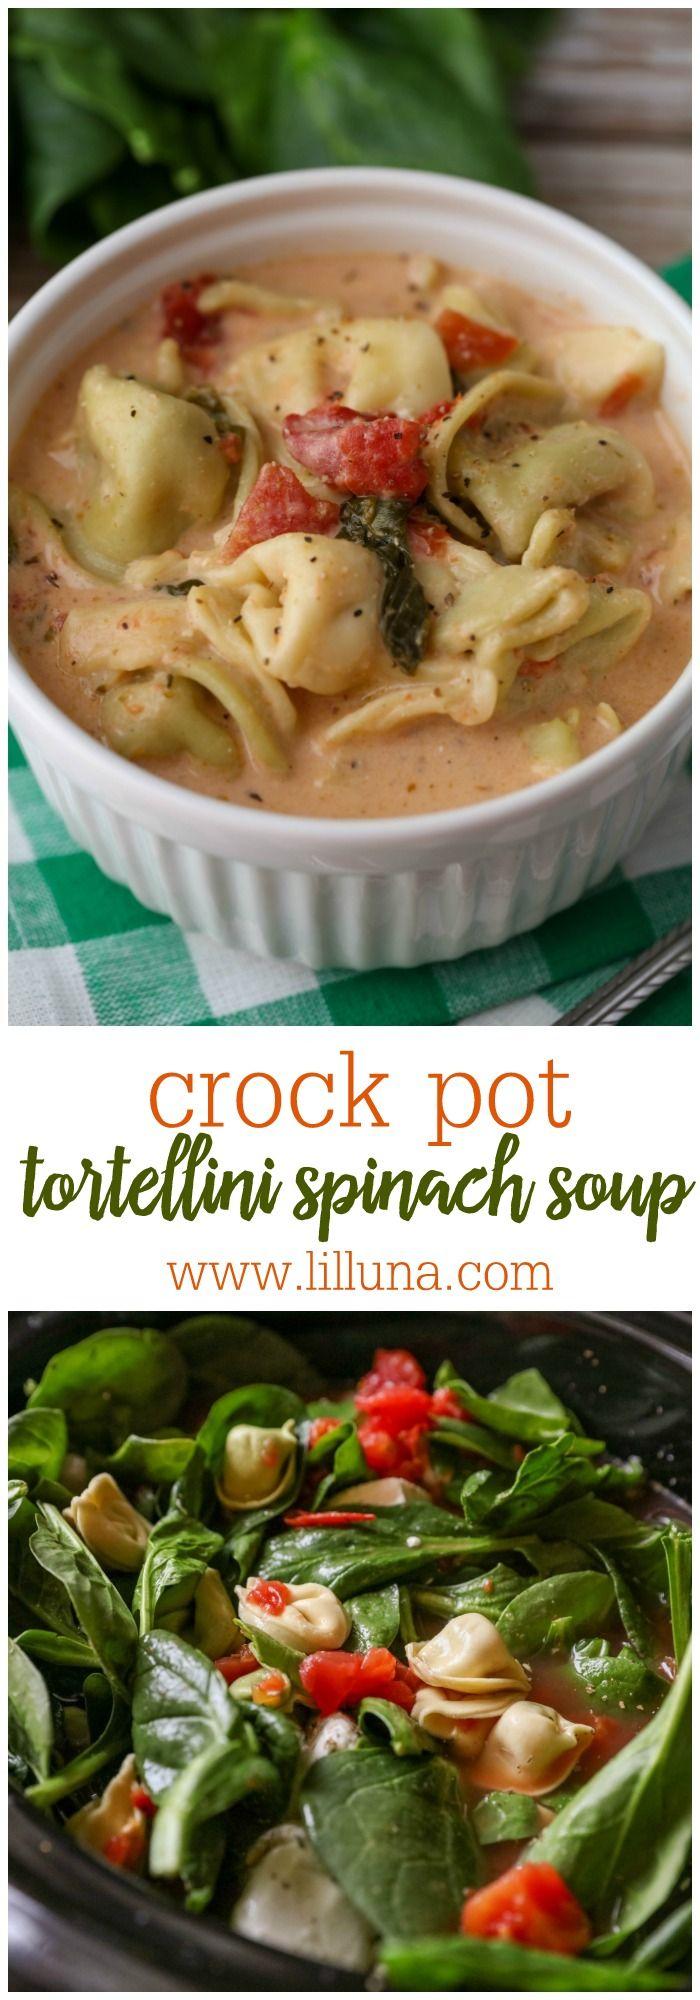 Crock Pot Tortellini Spinach Soup (+VIDEO) | Lil' Luna #spinachsoup